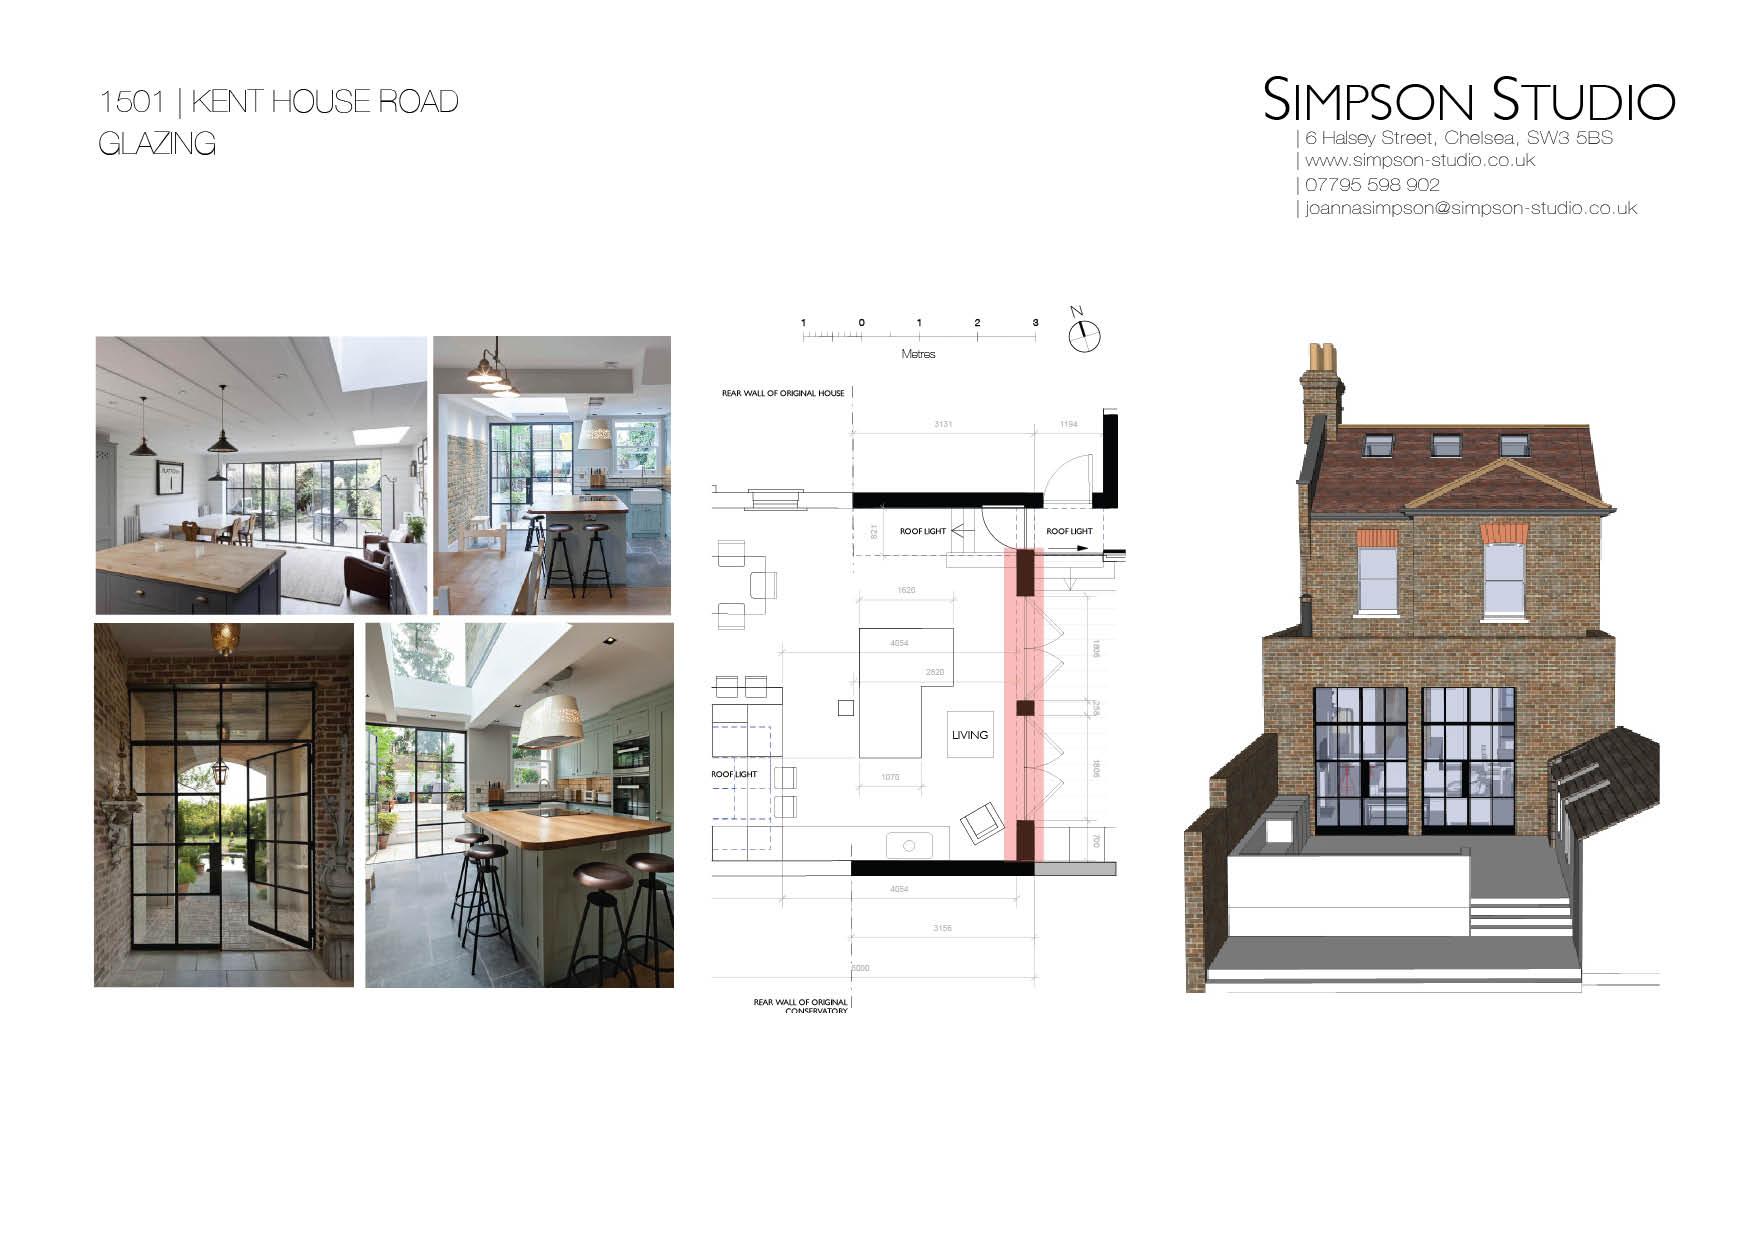 Kent House Road Room Planning19.jpg